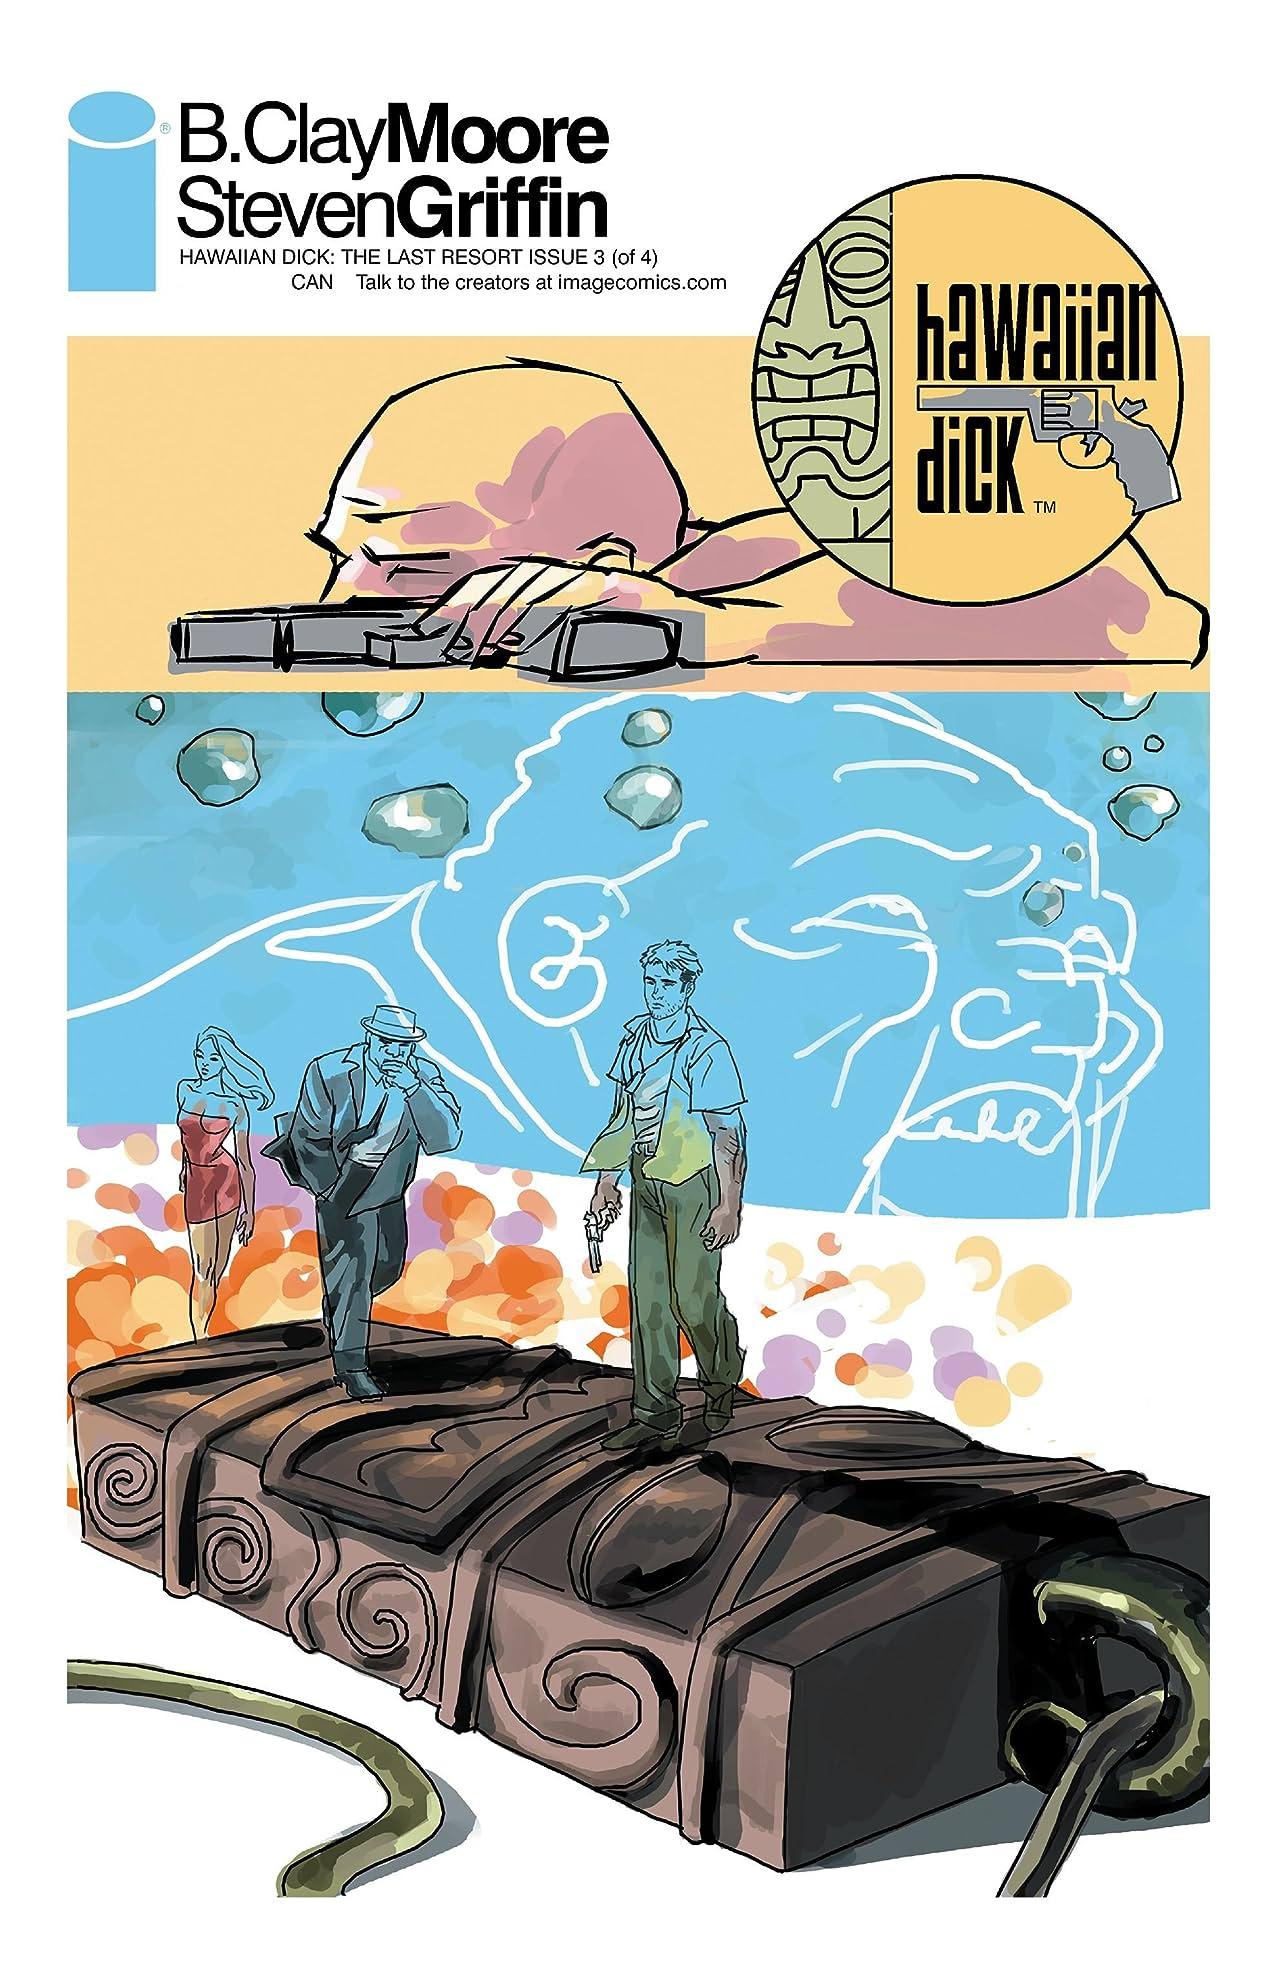 Hawaiian Dick: The Last Resort #3 (of 4)